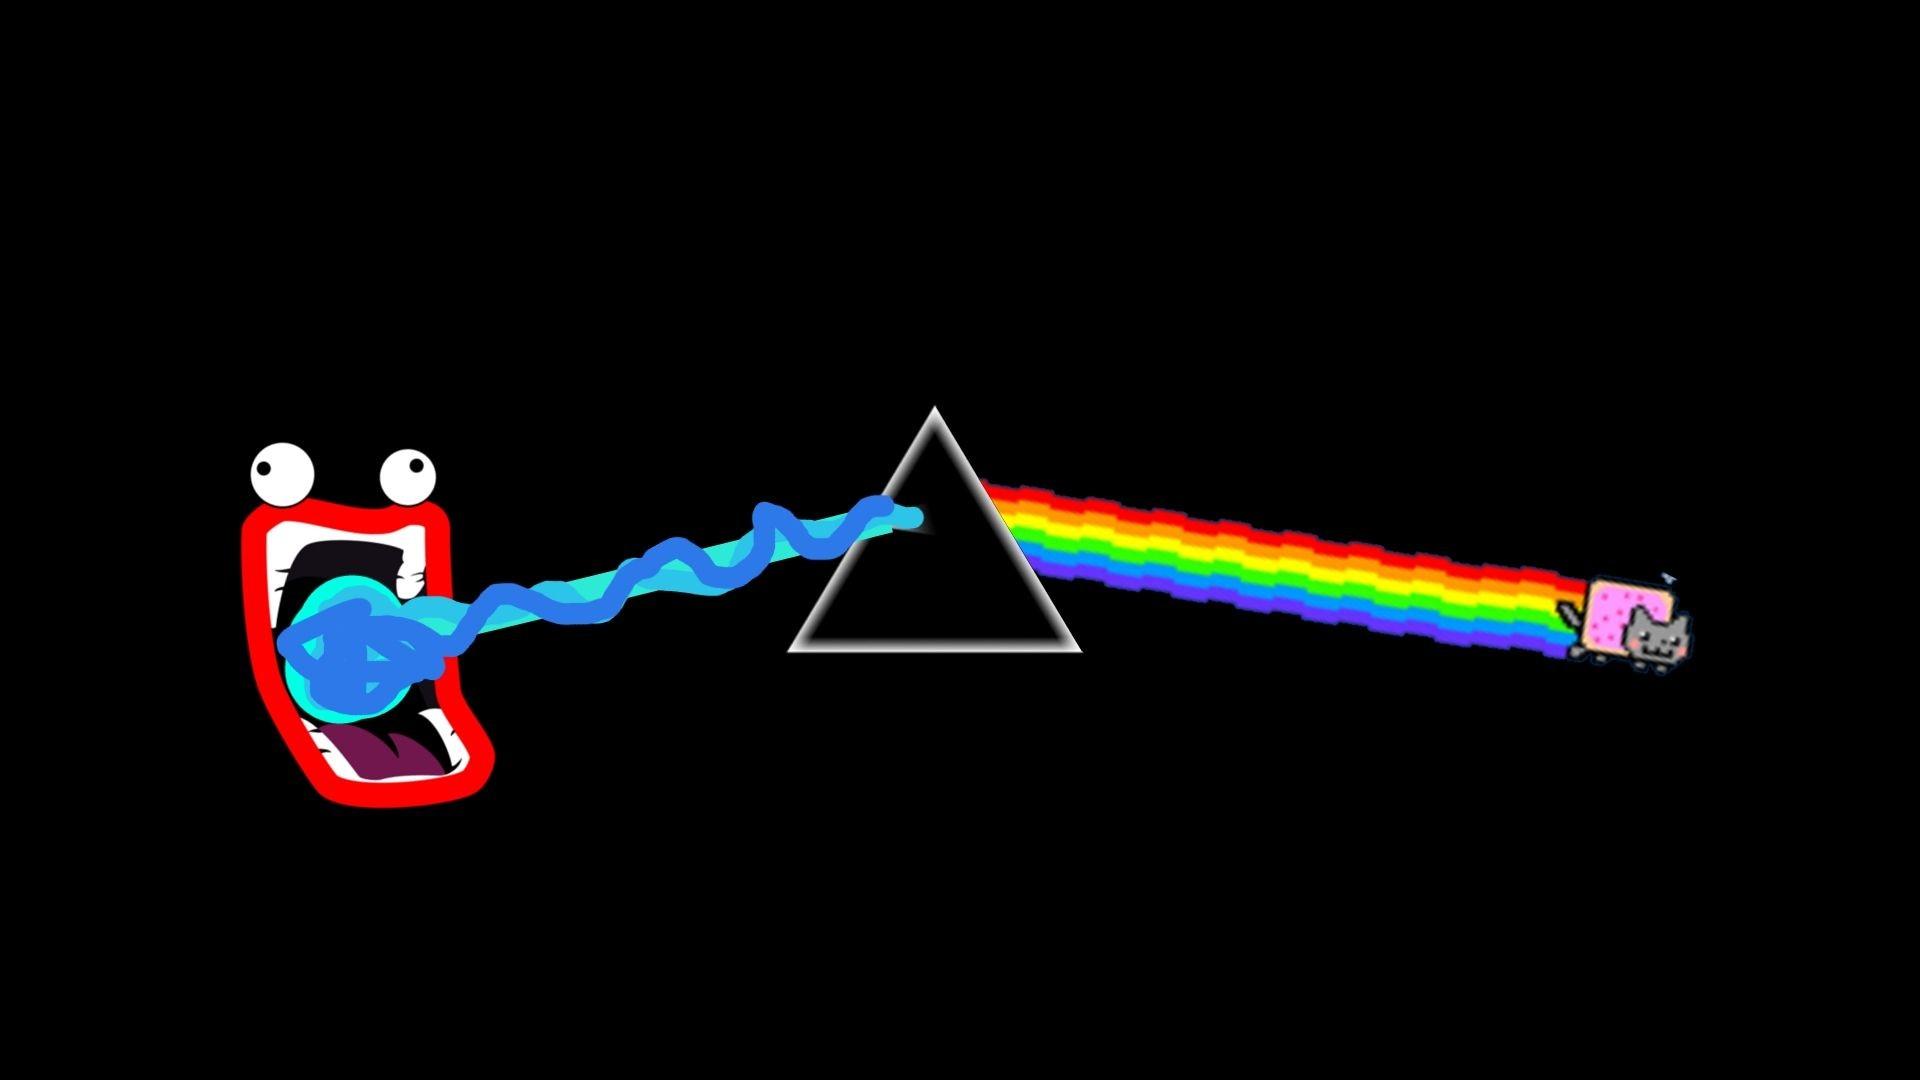 Pink Floyd Wallpaper Hd 181020